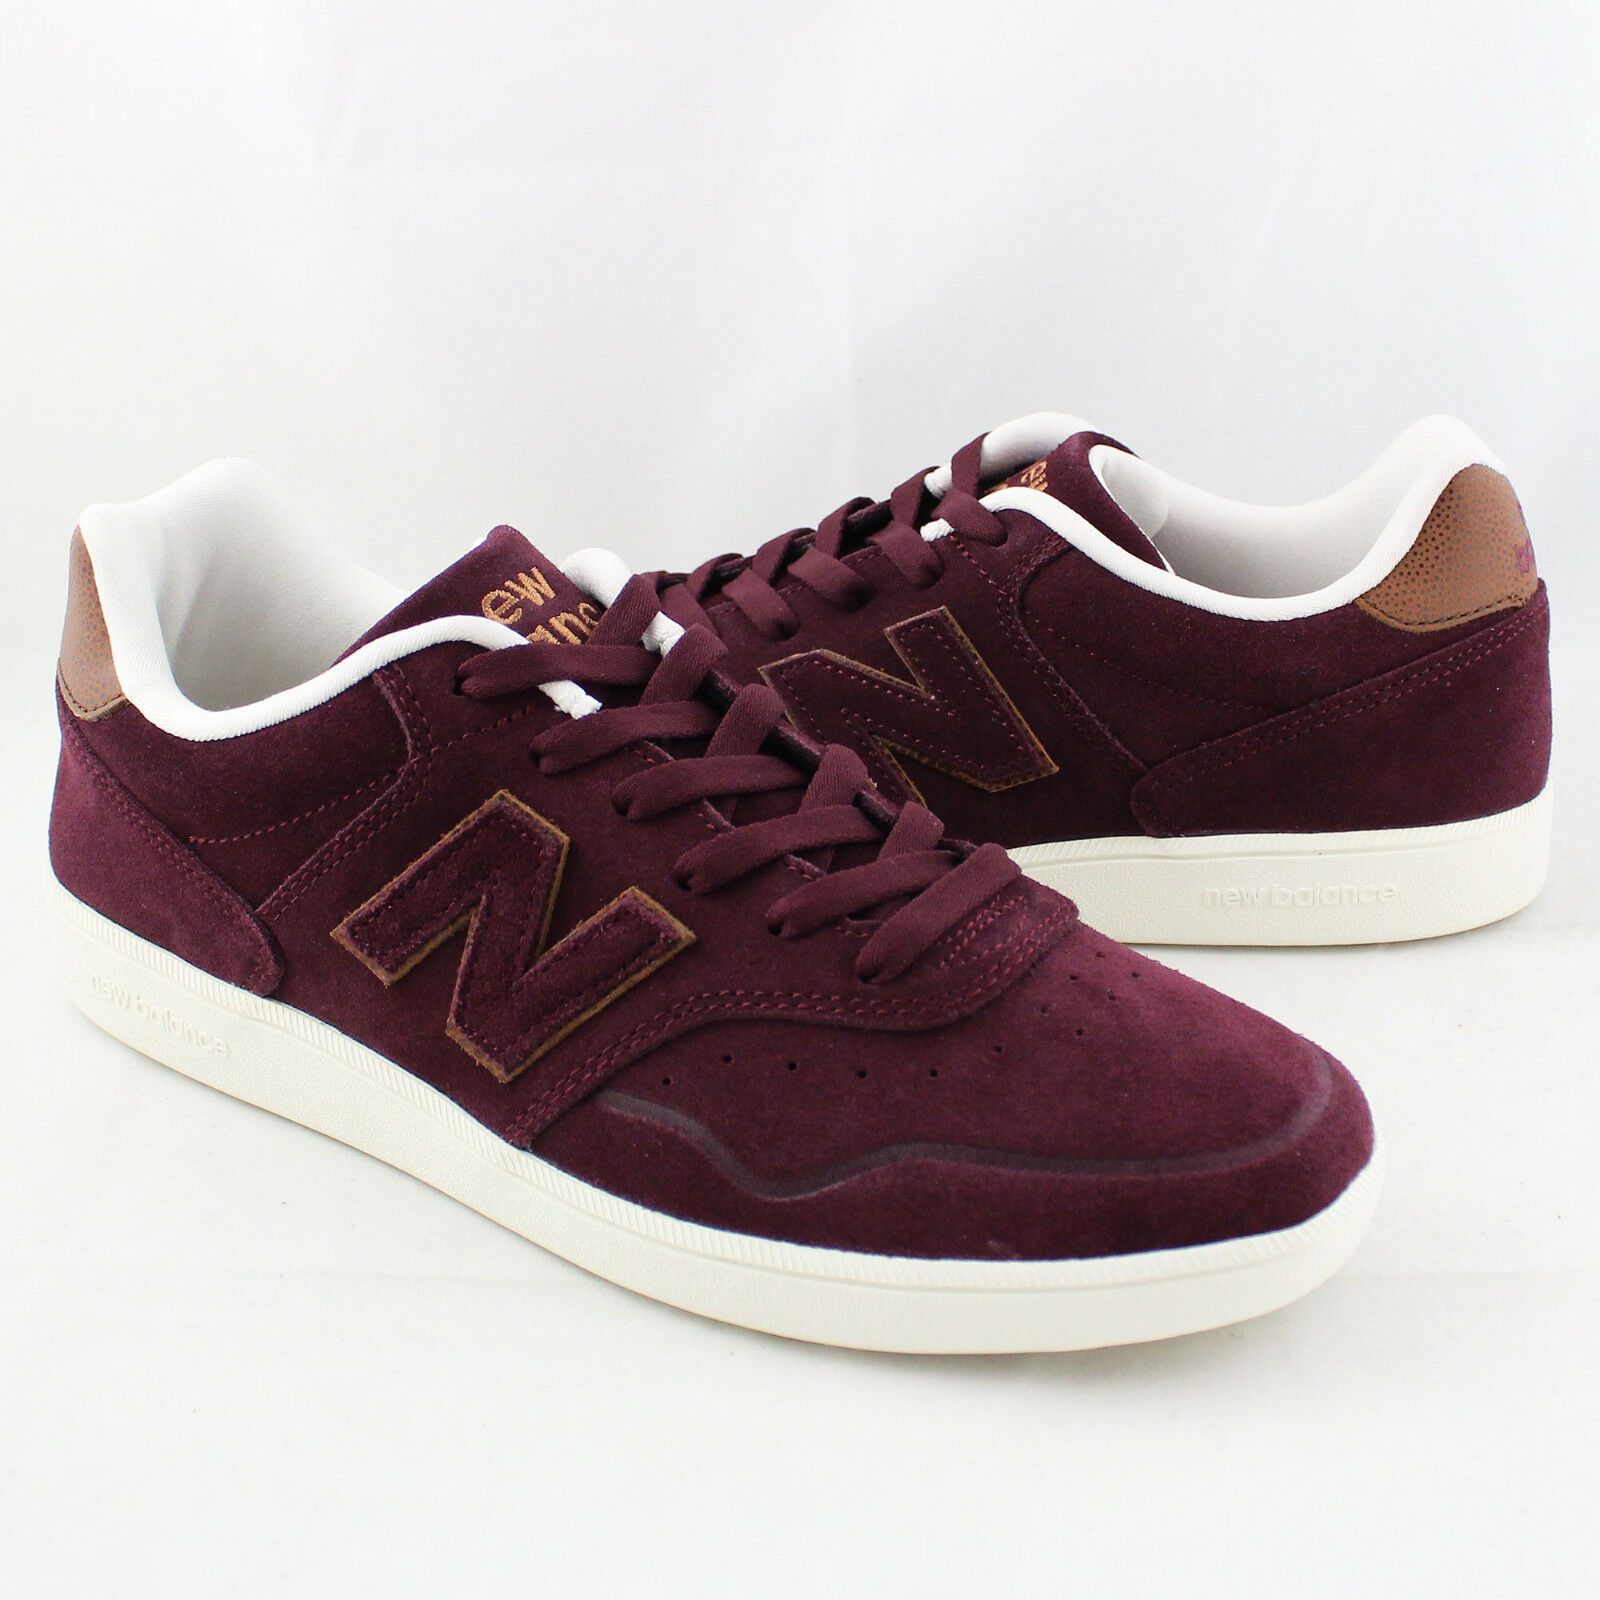 New Balance Numeric  shoes  SZ 9  NIB